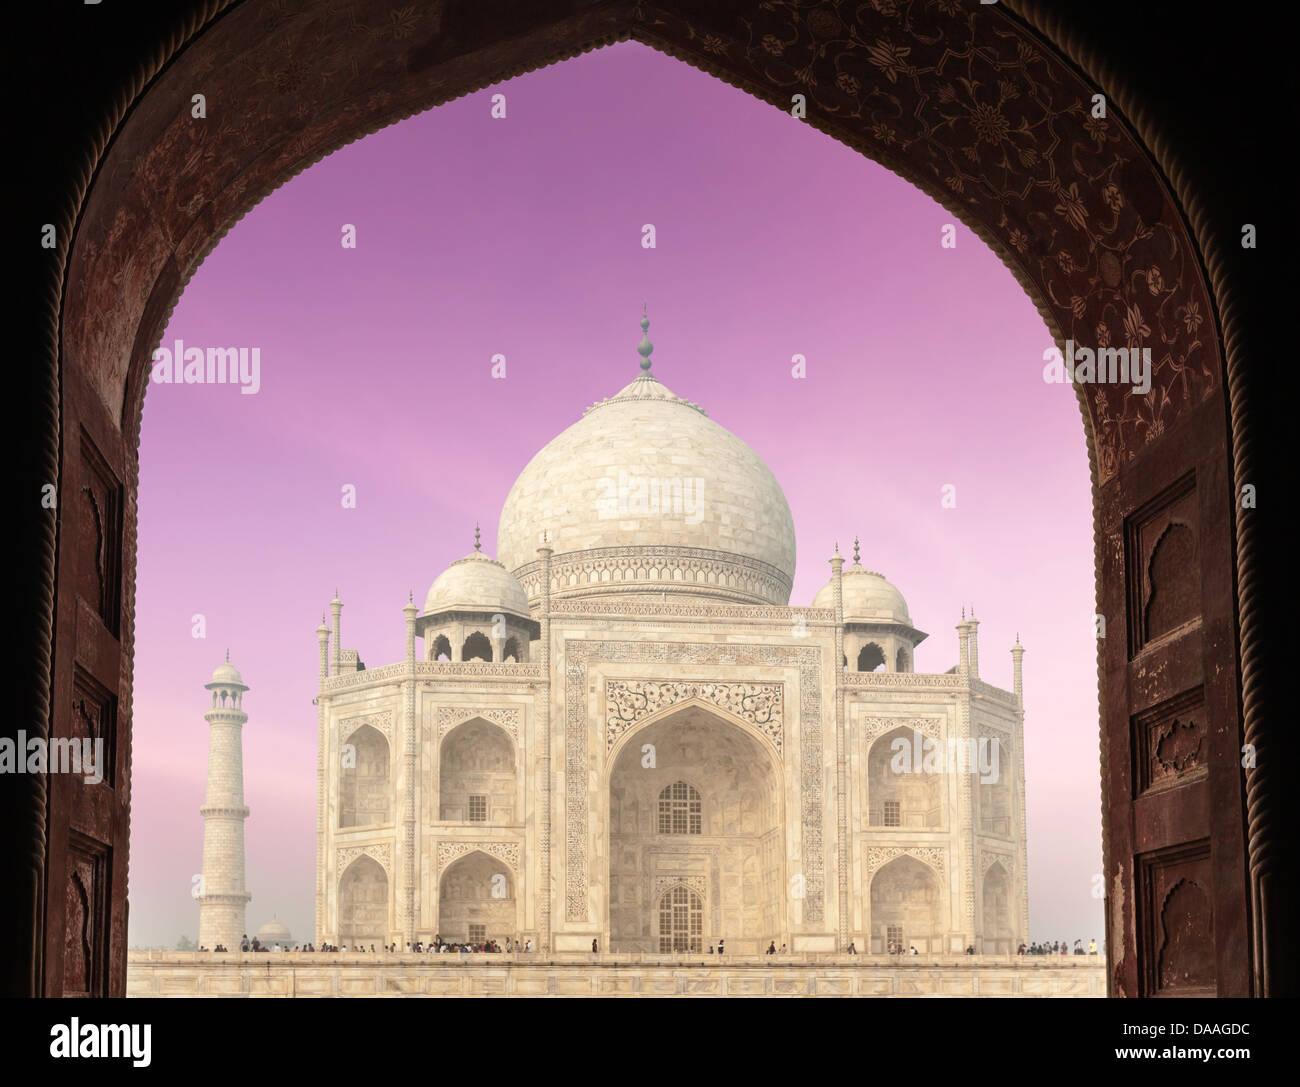 Taj Mahal par arch, symbole indien - Inde billet d'arrière-plan. Agra, Uttar Pradesh, Inde Photo Stock